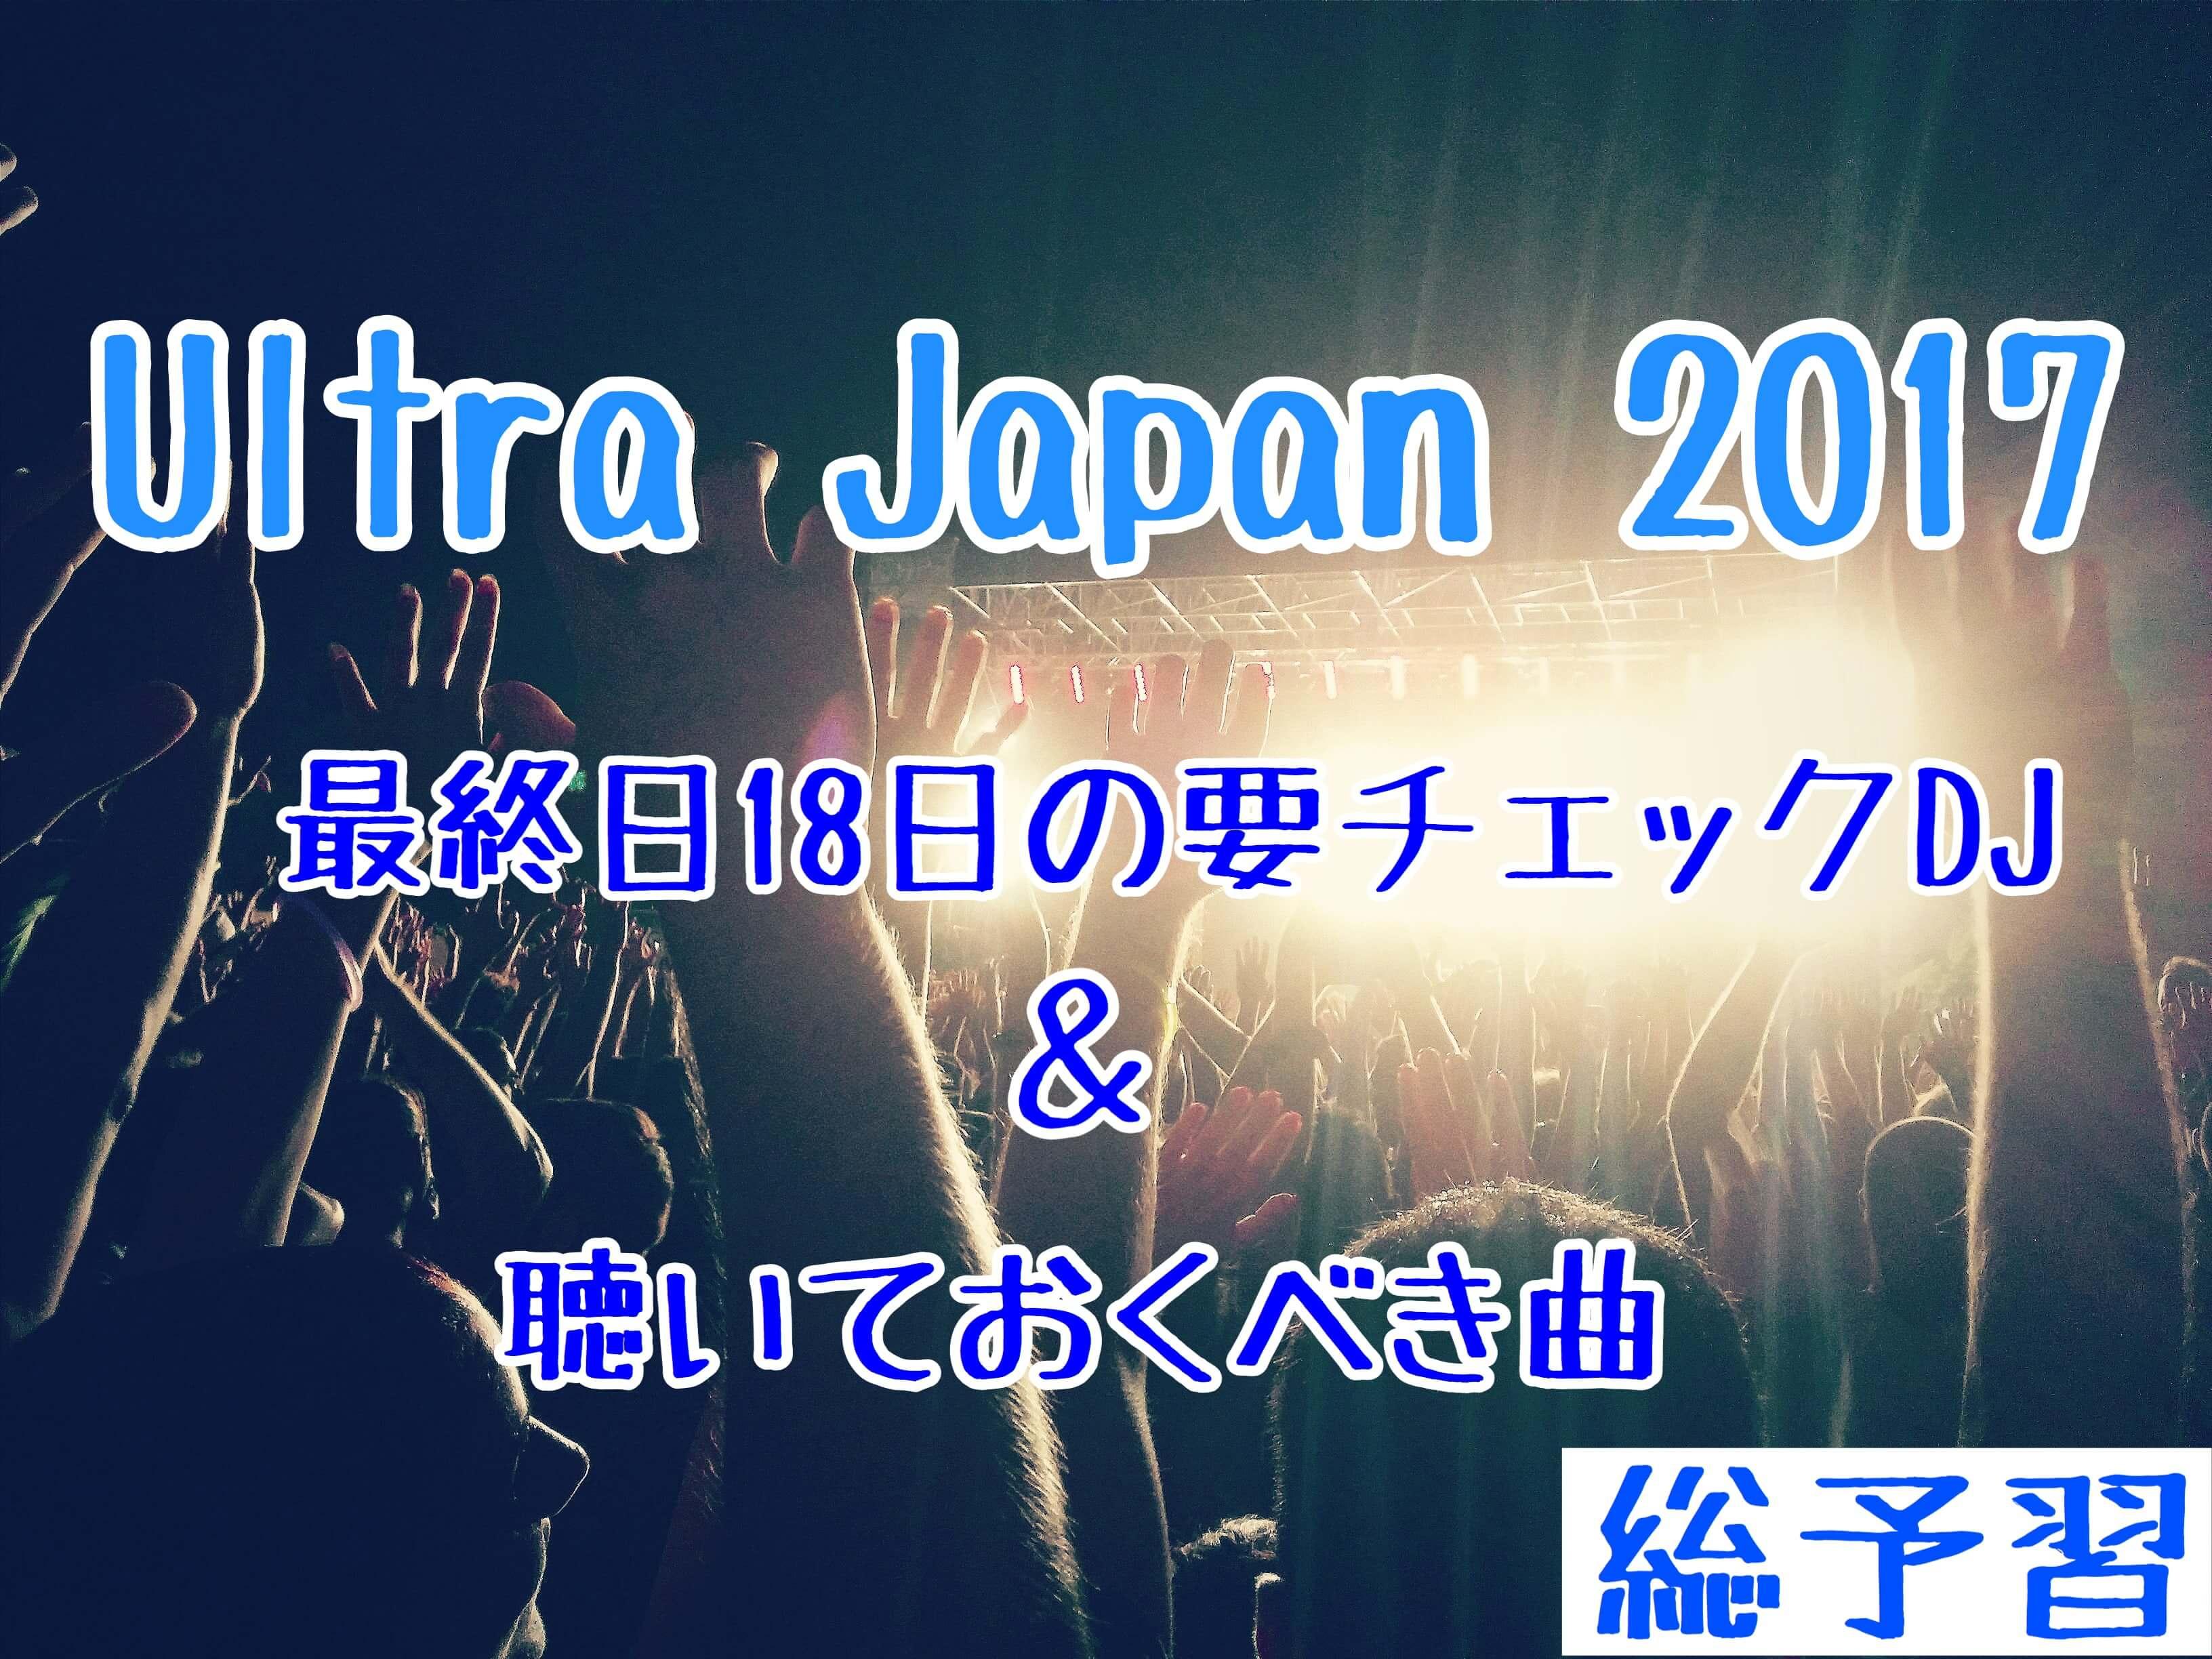 Ultra Japan 2017 最終日18日 出演DJ